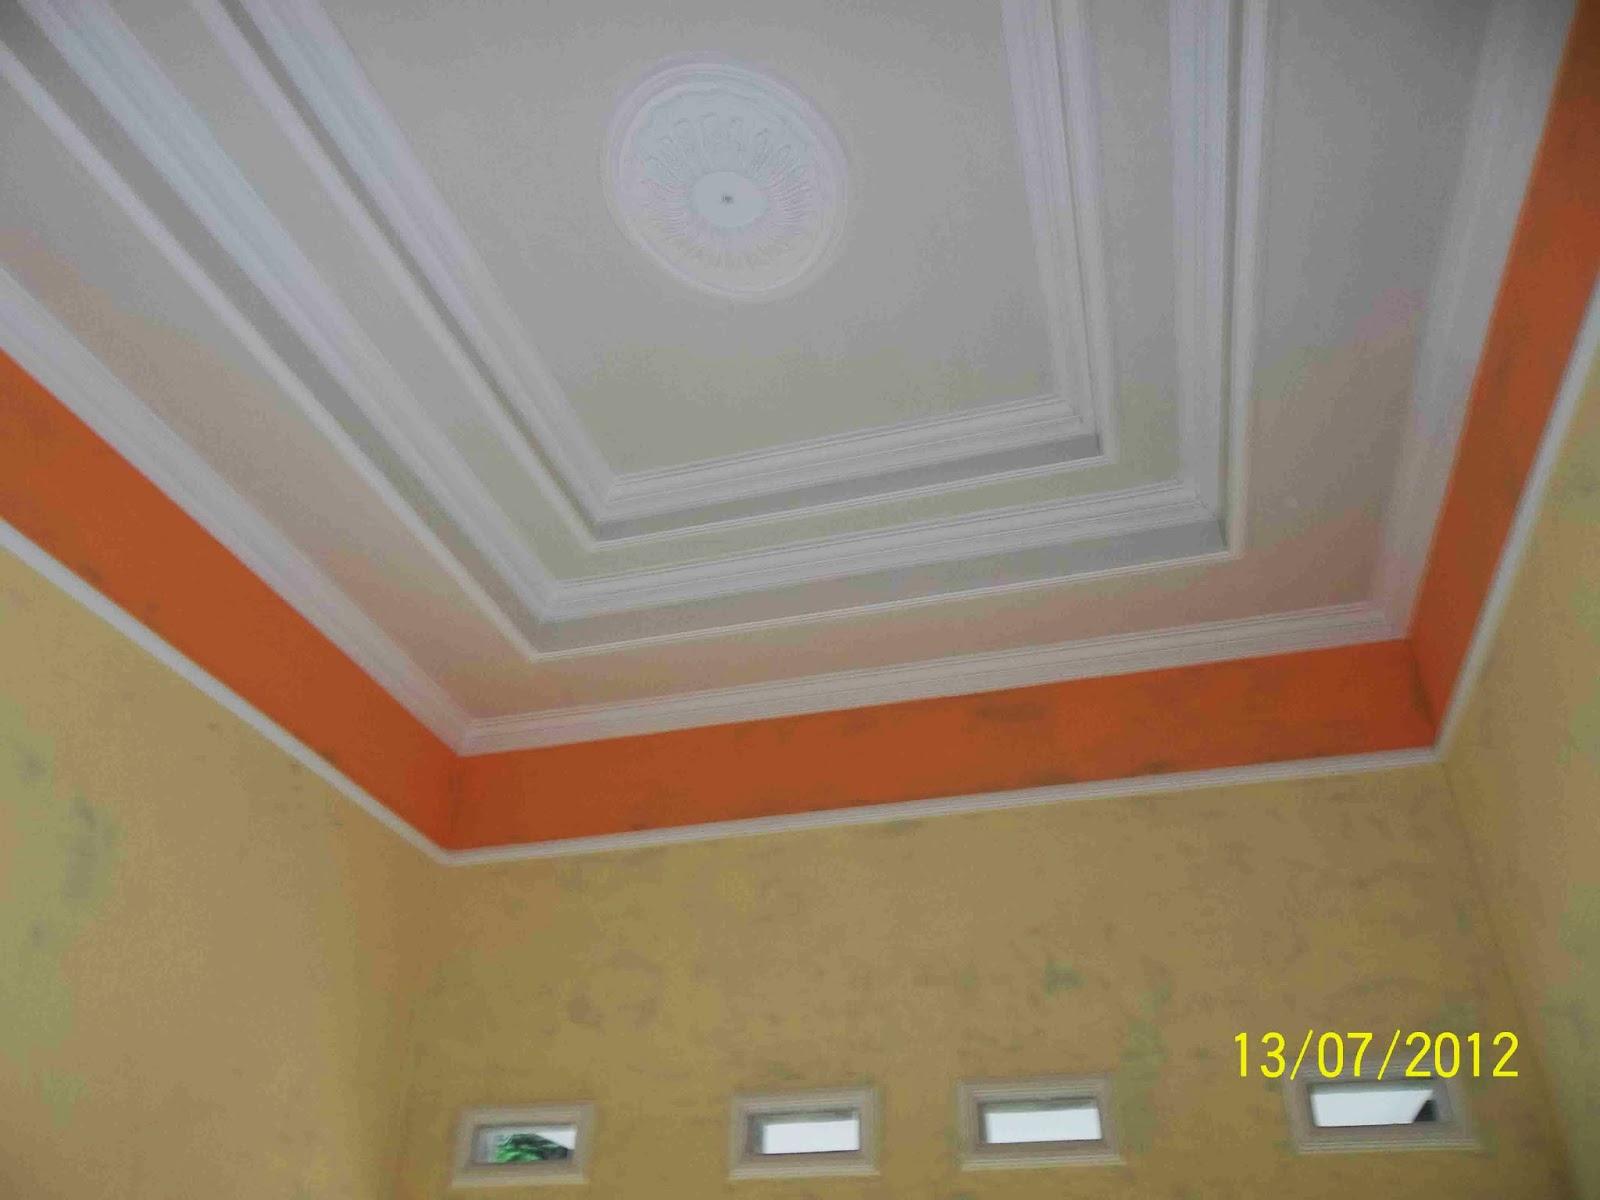 Baja Ringan - Plafon): Pemasangan plafond Gypsum, Partisi,baja ringan